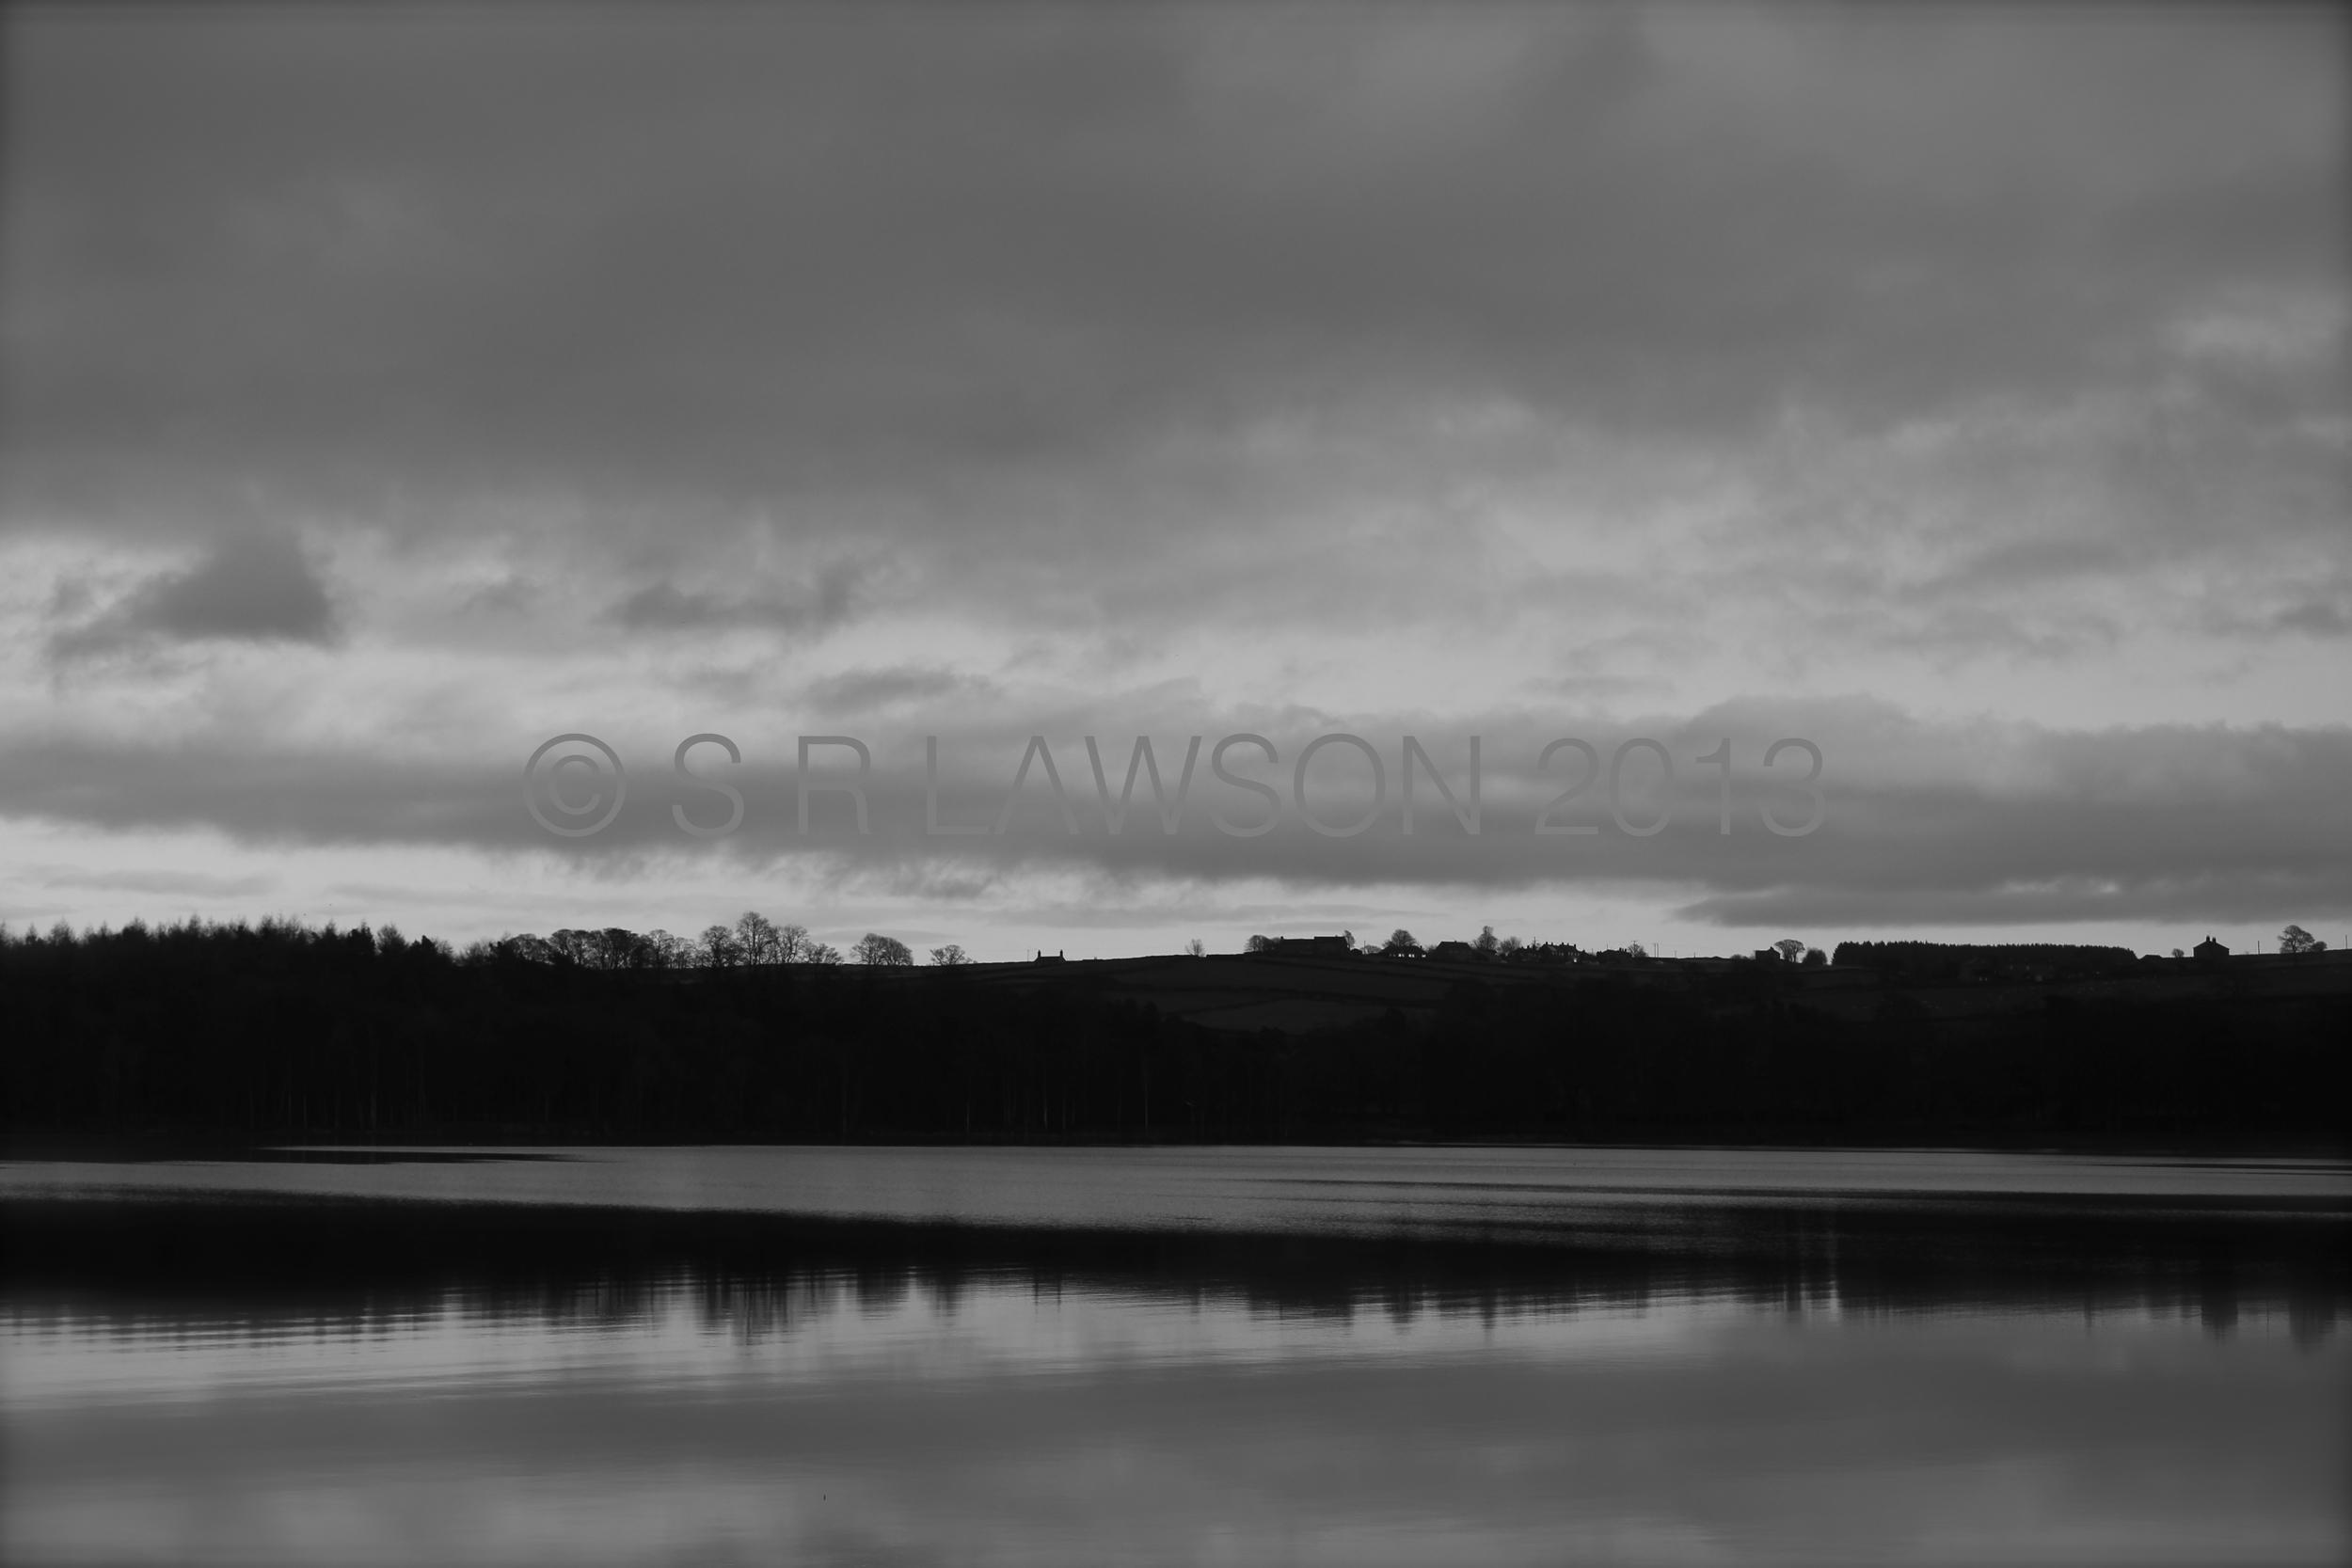 Across the Reservoir